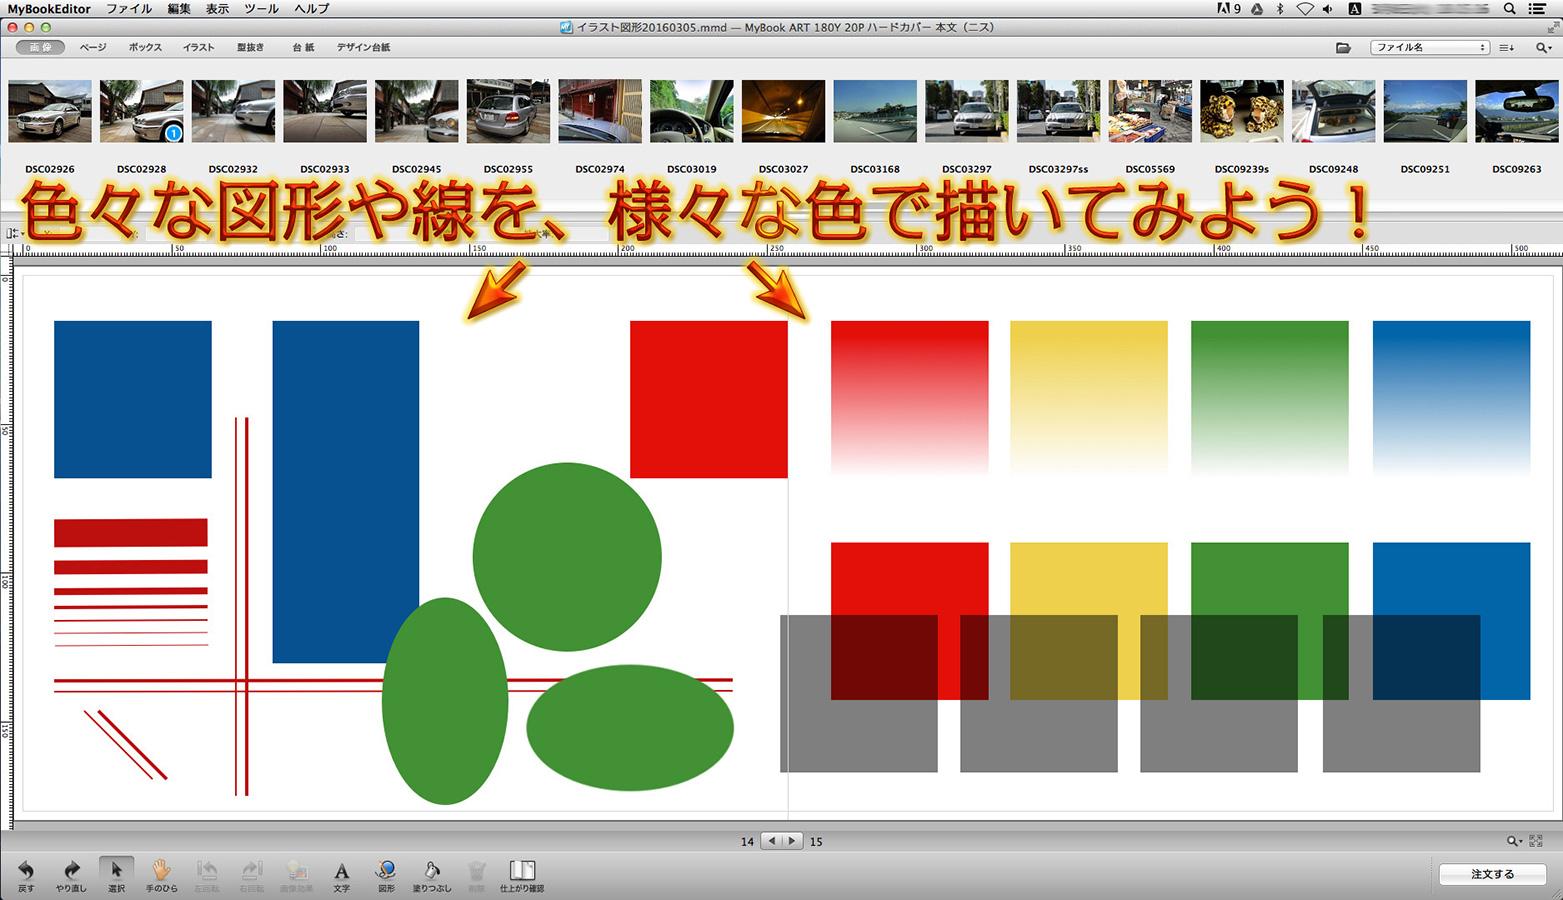 http://moritetsu.info/car/img/mb073-2016-03-08-18-15-16sssss.jpg